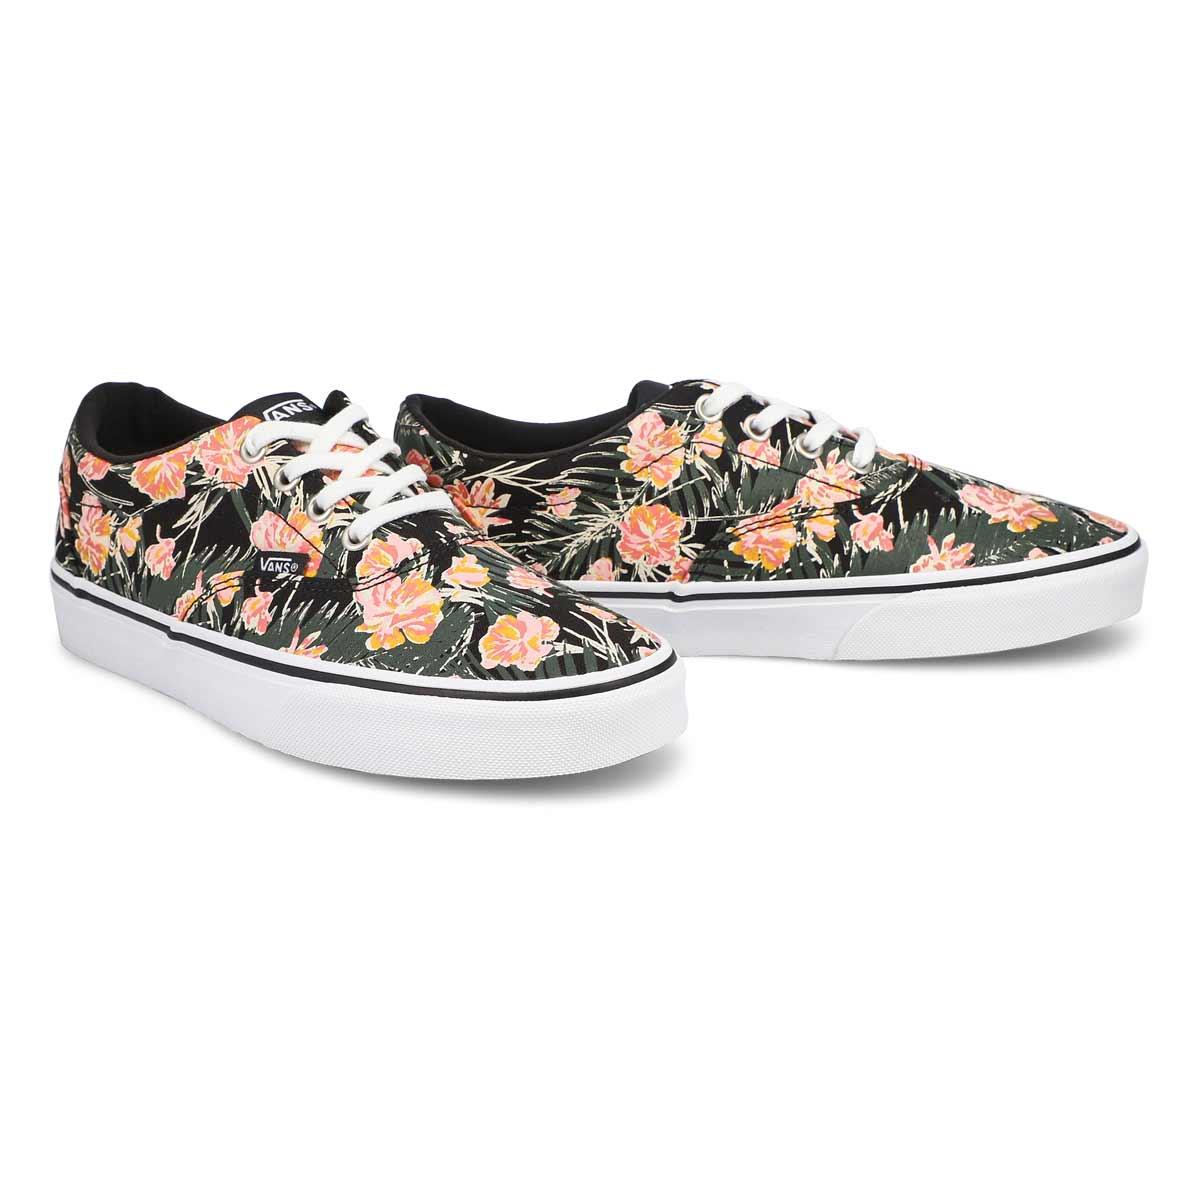 Women's Doheny Palm Sneaker - Floral